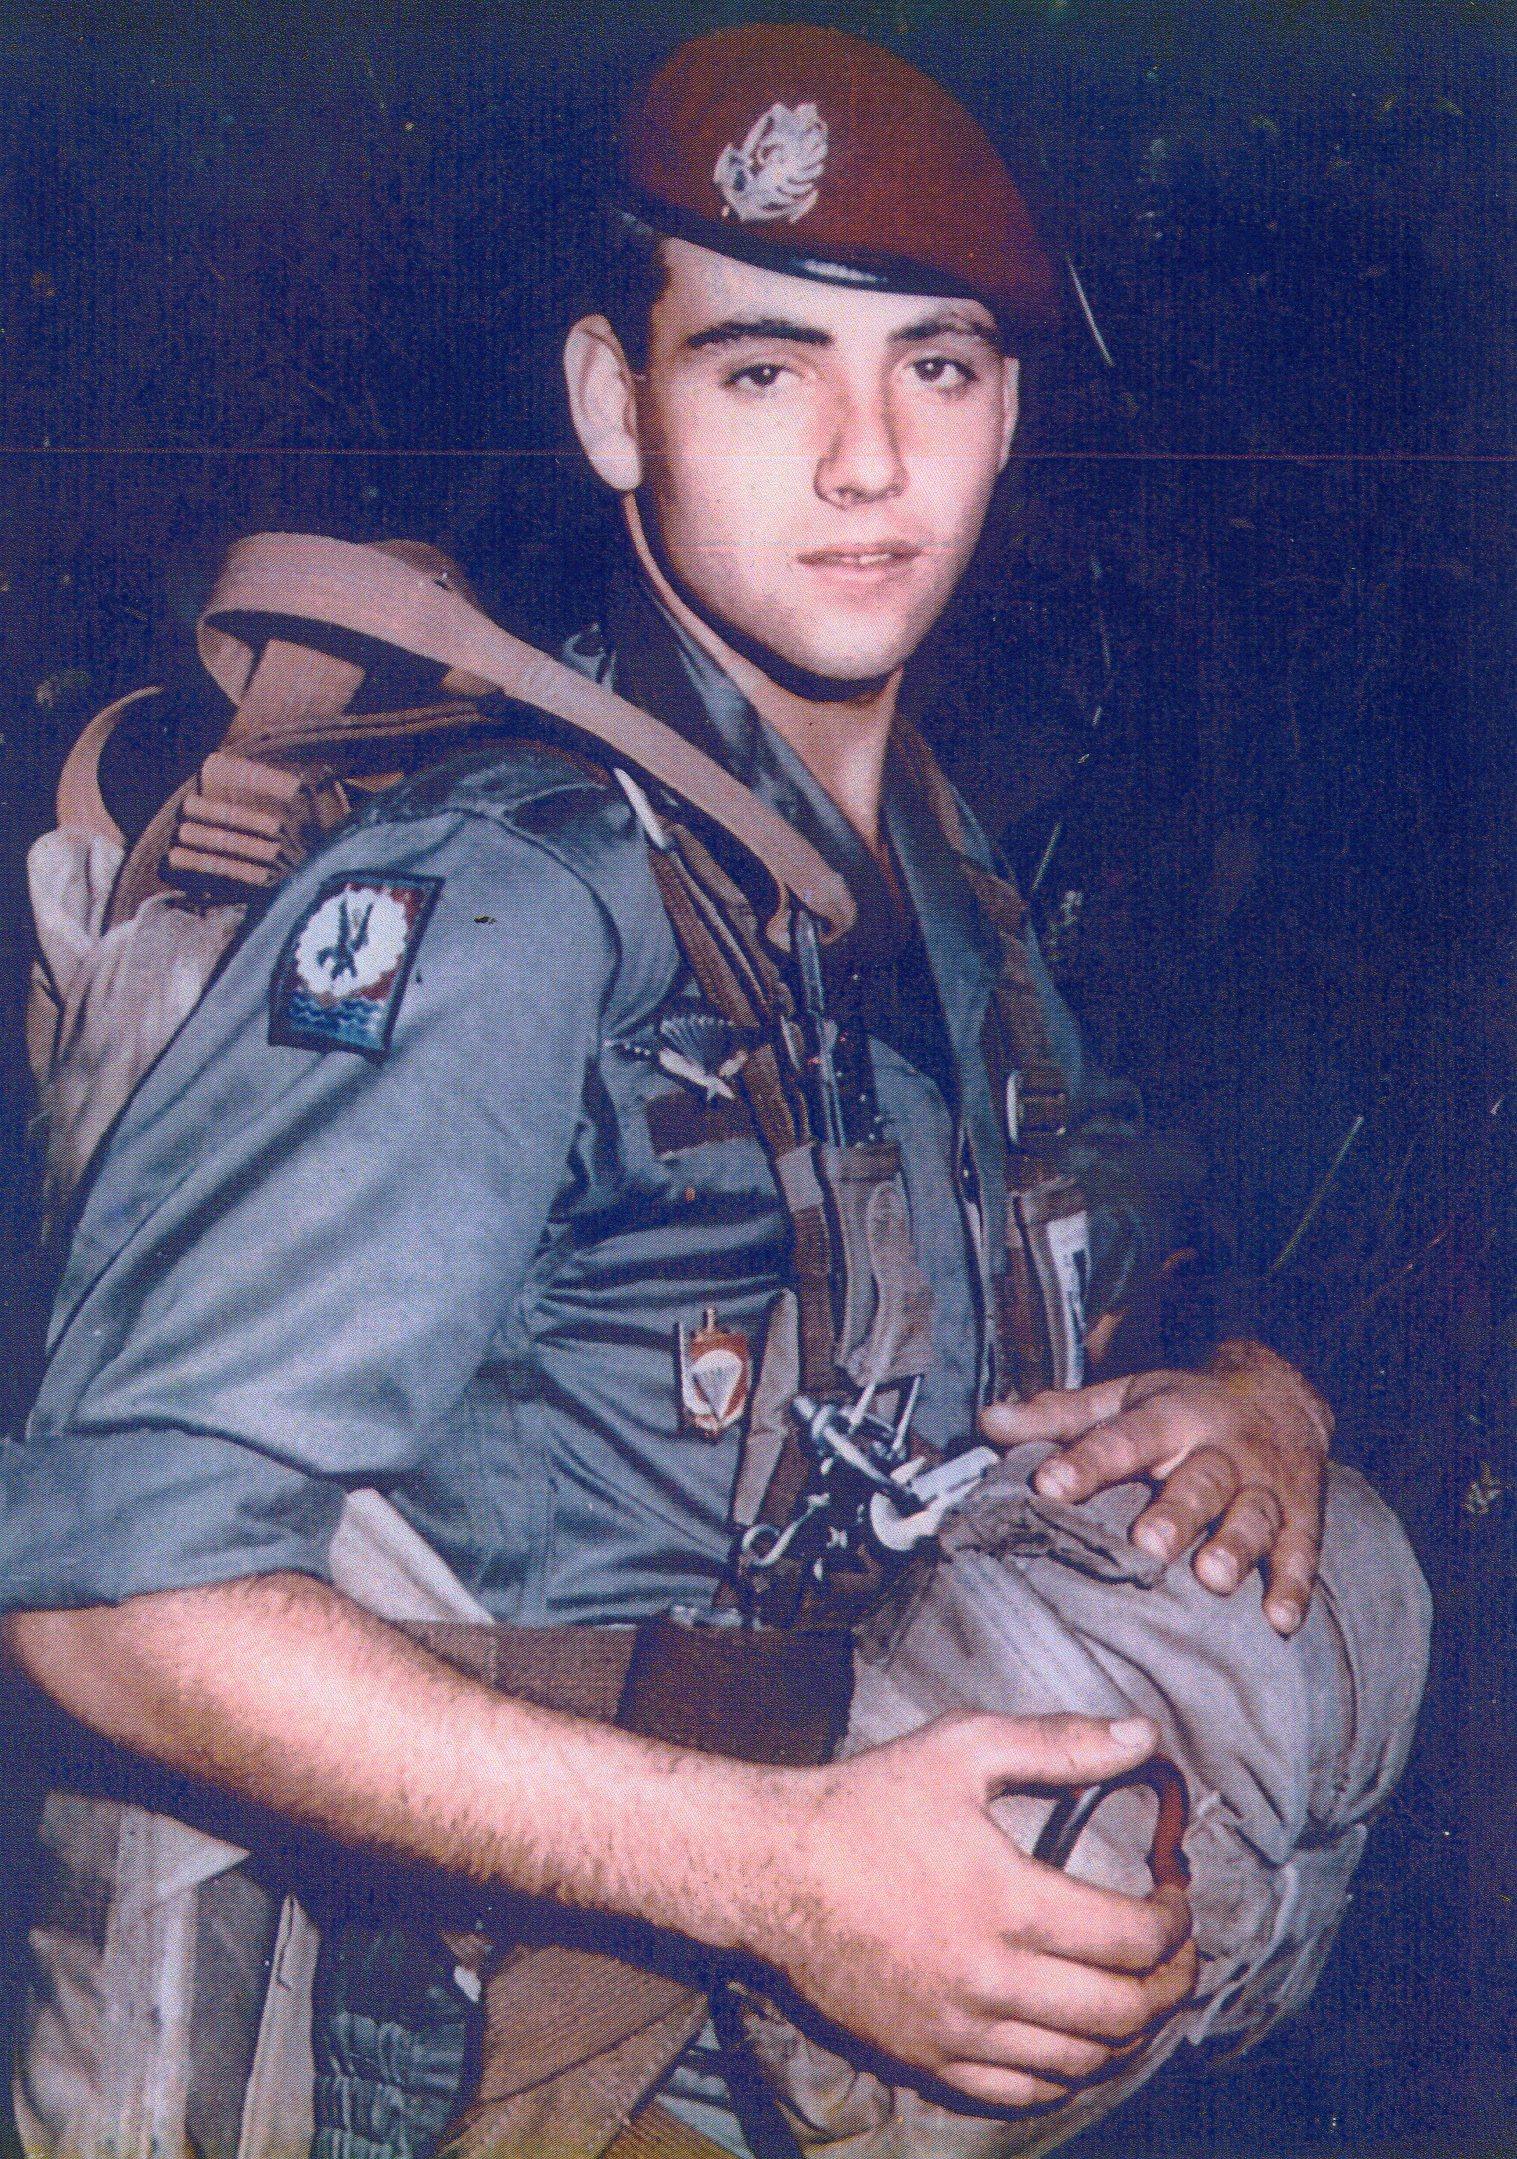 01/05/1980 - 1ere Classe Patrick, Thomas ALEMAN (19 ans) - 3eme RPIMa